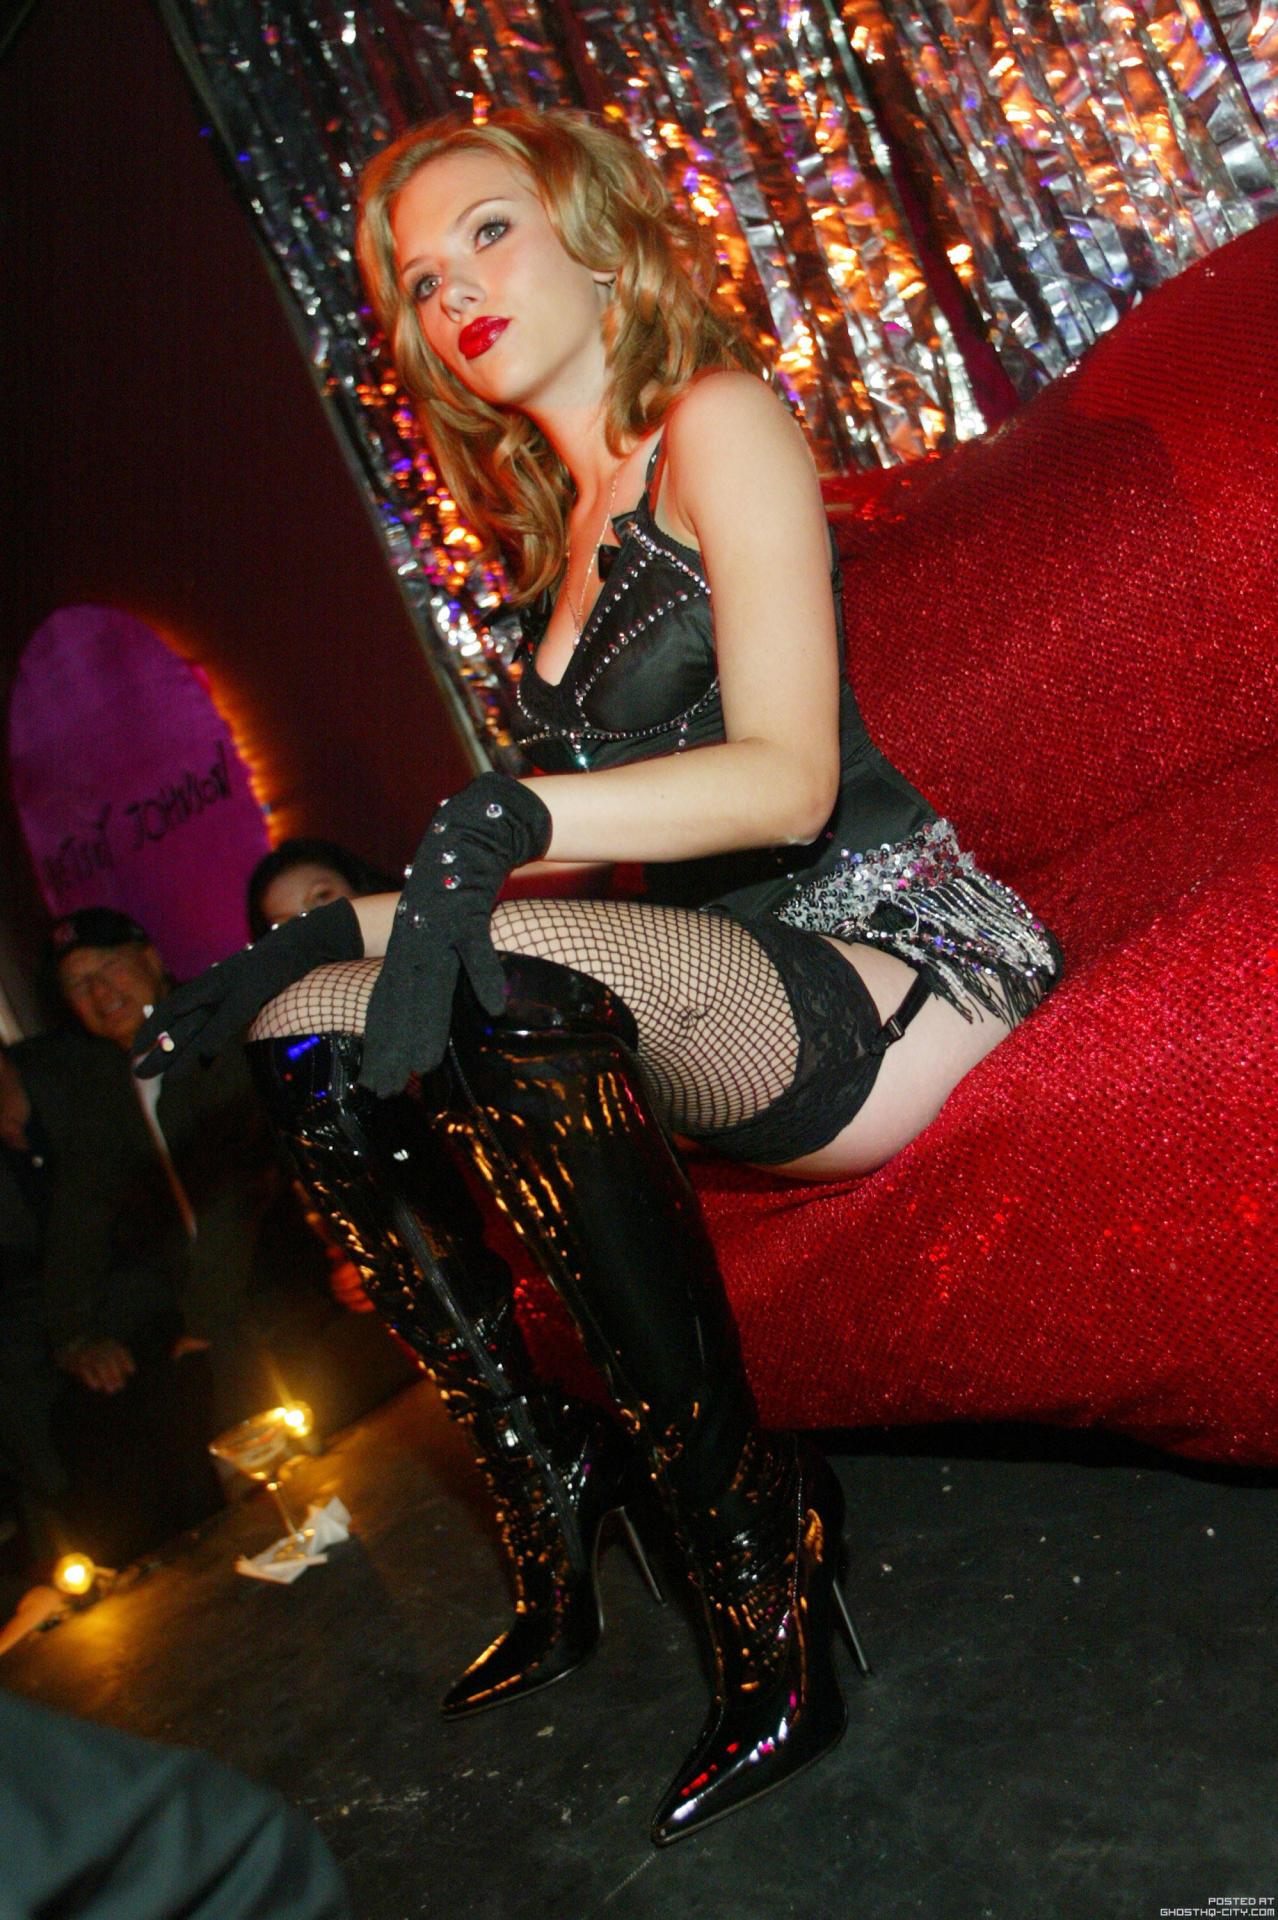 Scarlett Johansson #Scarlett Johansson#actress#celebrity#gorgeous#stunning#hot celebs#hottie